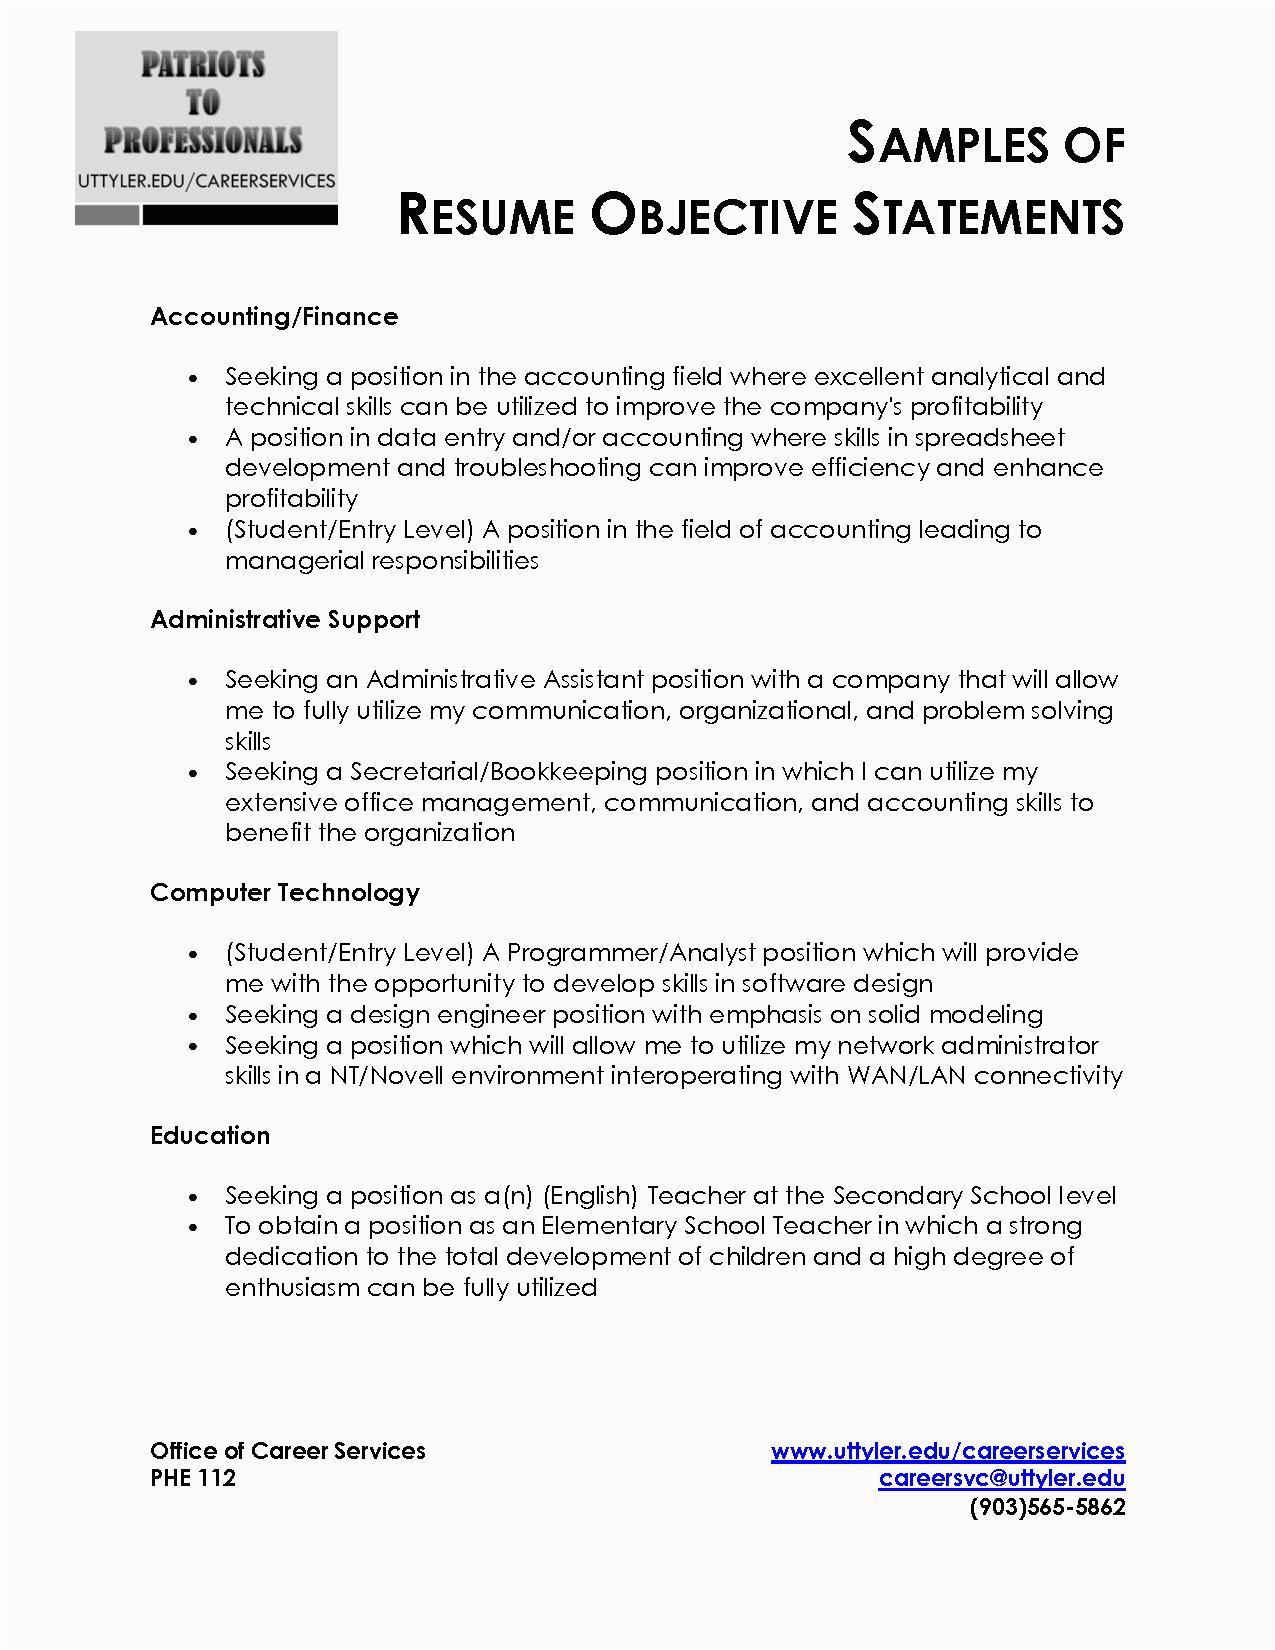 resume objective statement 2603